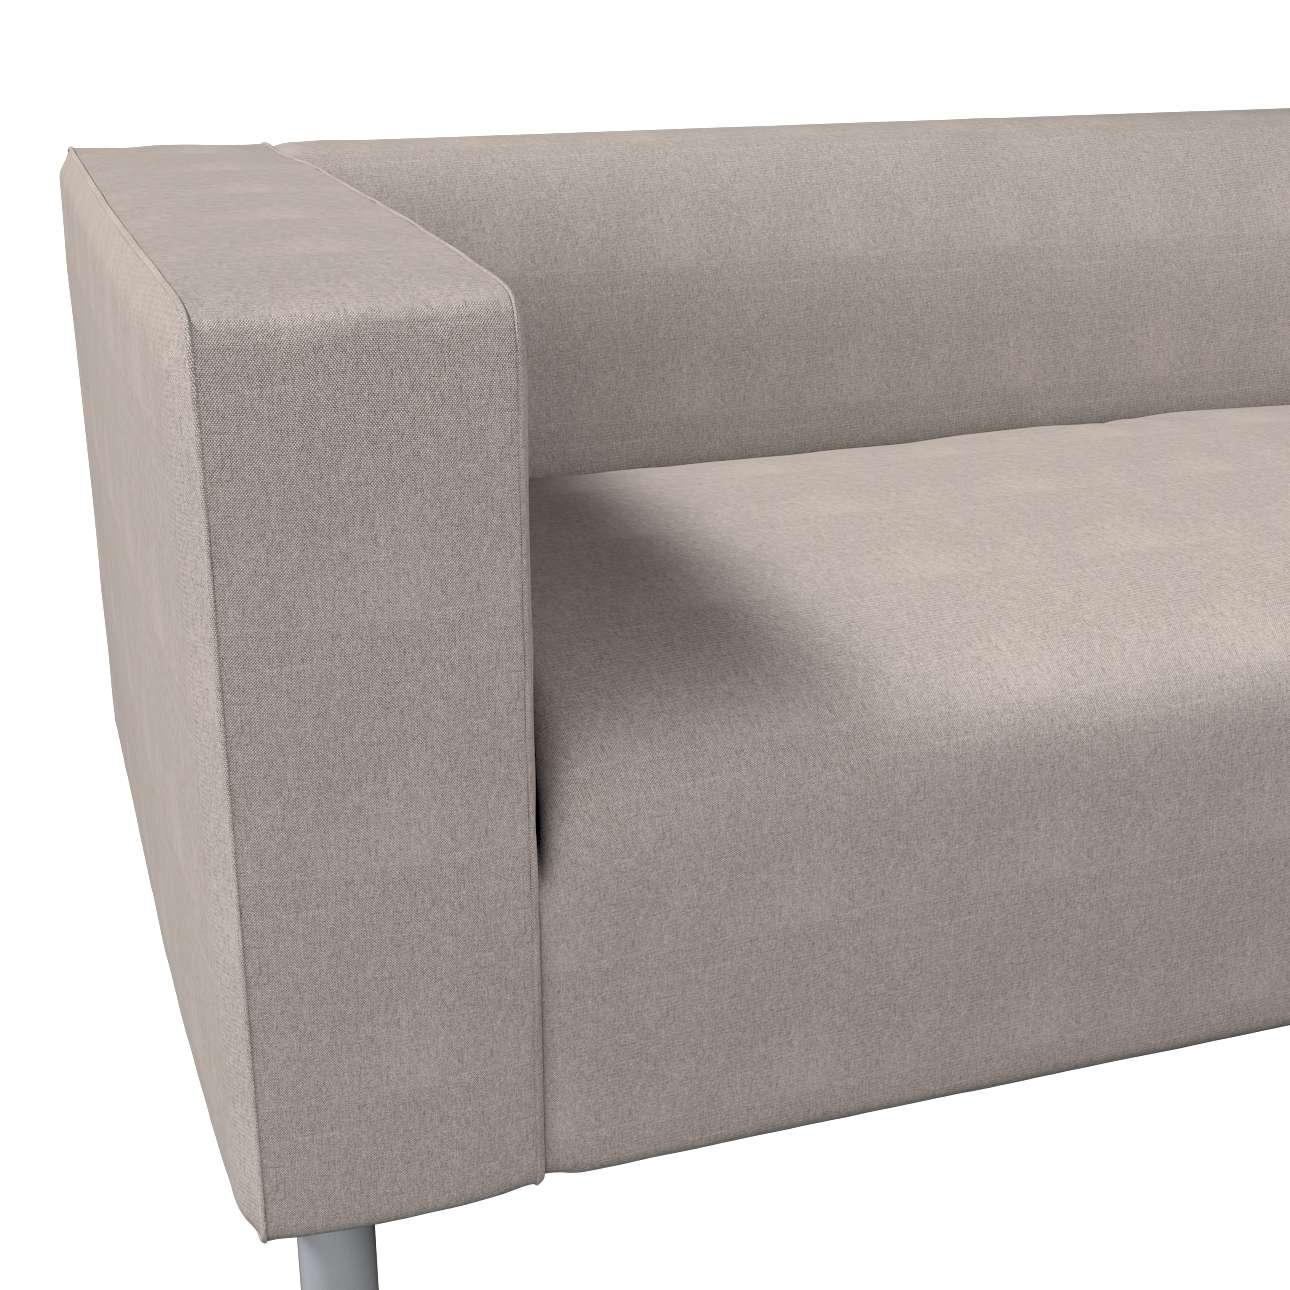 Klippan keturvietės sofos užvalkalas kolekcijoje Etna, audinys: 705-09